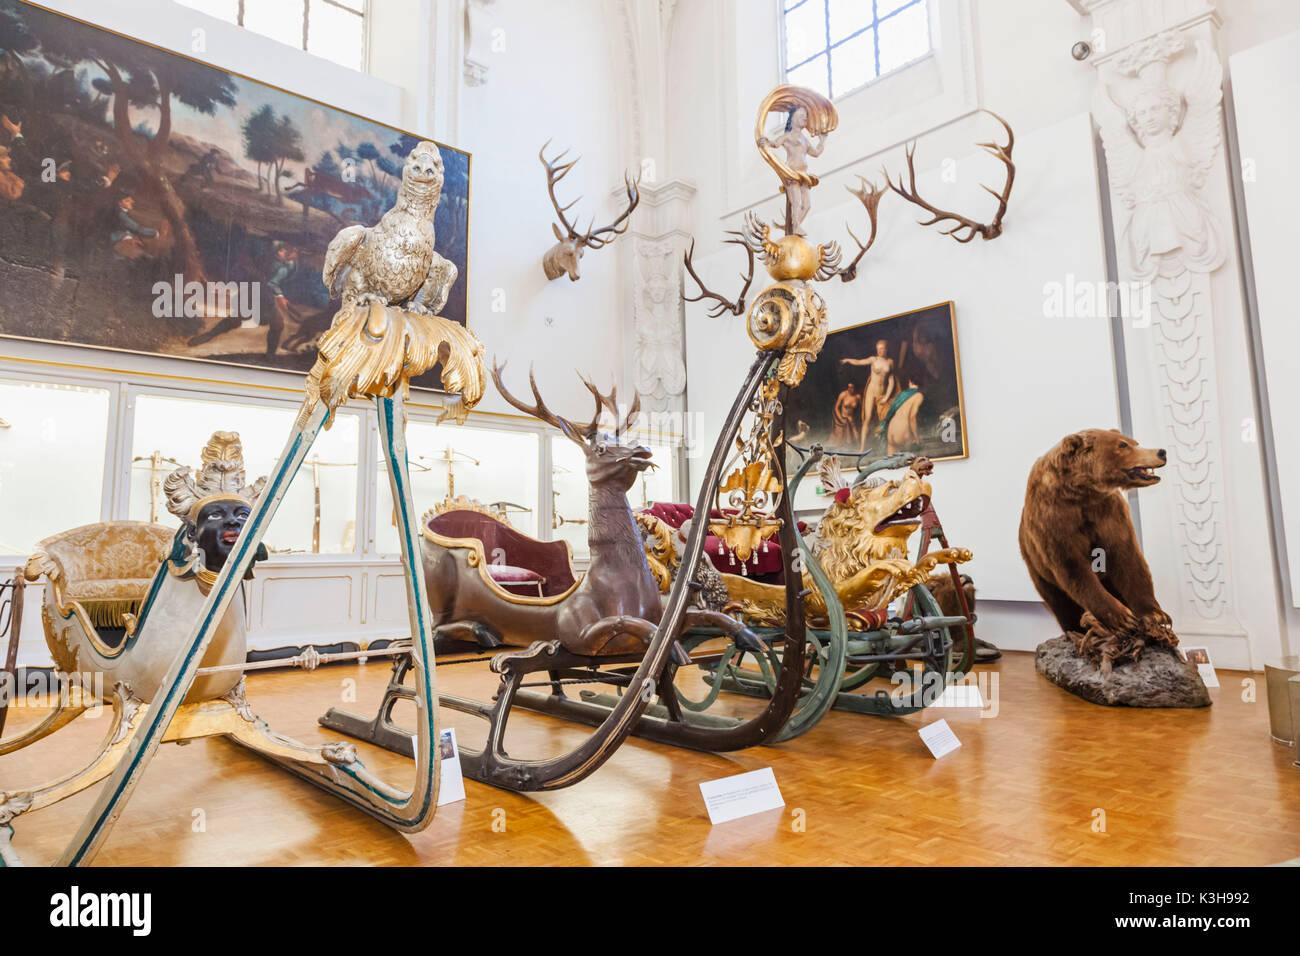 Germany, Bavaria, Munich, The German Hunting and Fishing Museum (Deutsches Jagd-Und Fischereimuseum), Exhibit of Historical Sleighs - Stock Image